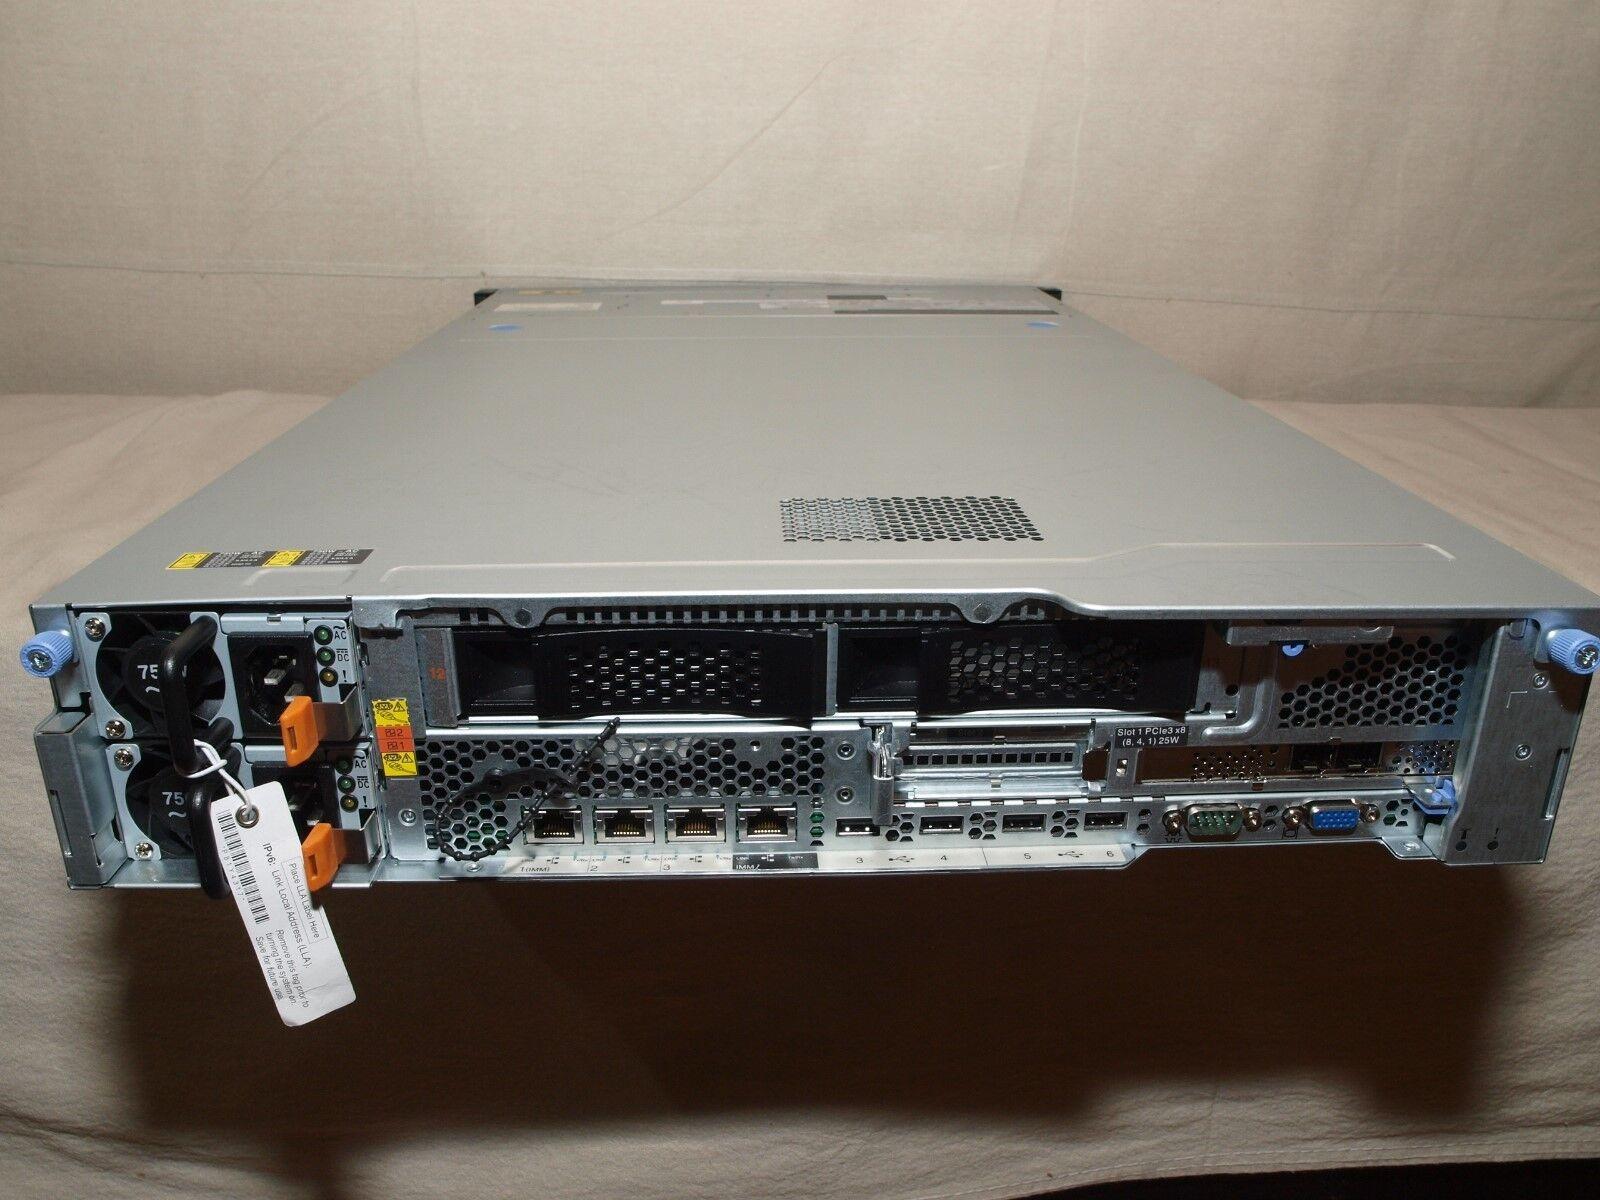 IBM QRadar xx05 G2 Server 4380Q1E - 9x1TB SAS HDD, 64GB RAM - NEW |  Shopping Bin - Search eBay faster